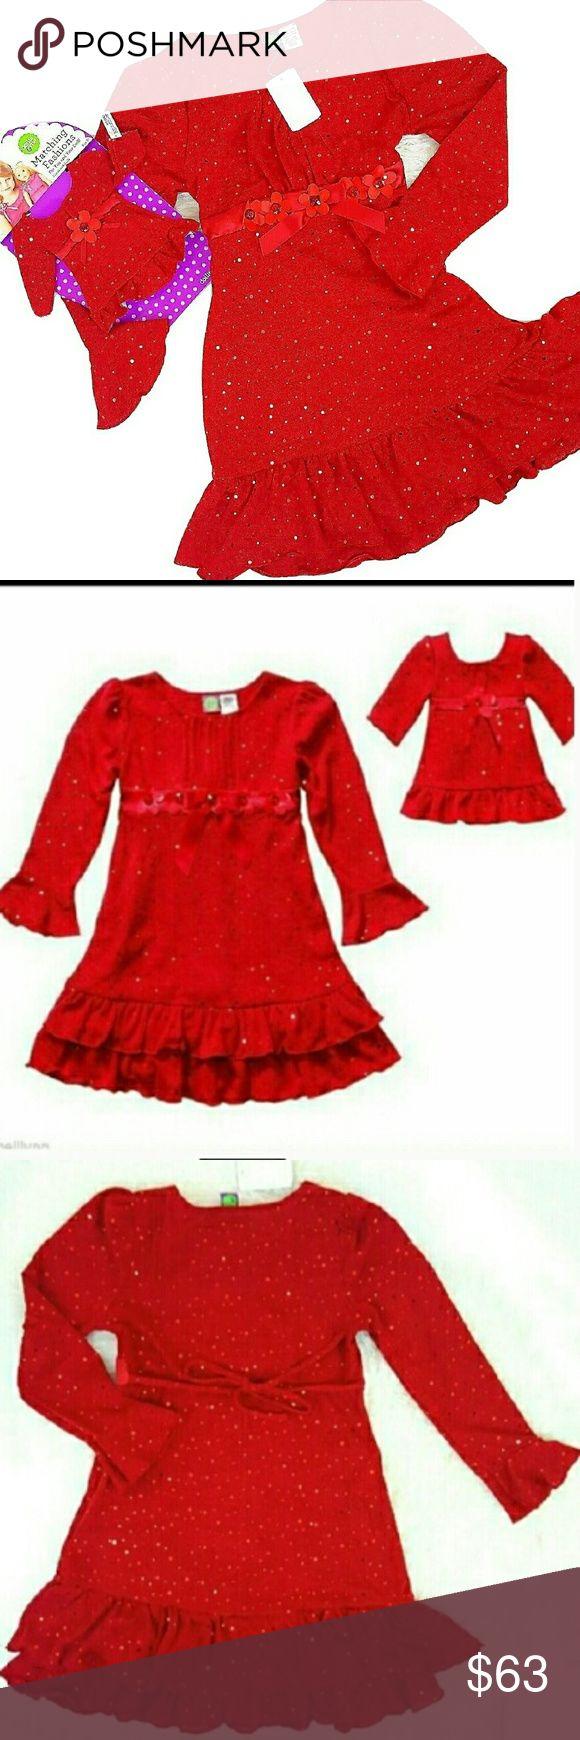 The 25+ best Red dresses for kids ideas on Pinterest